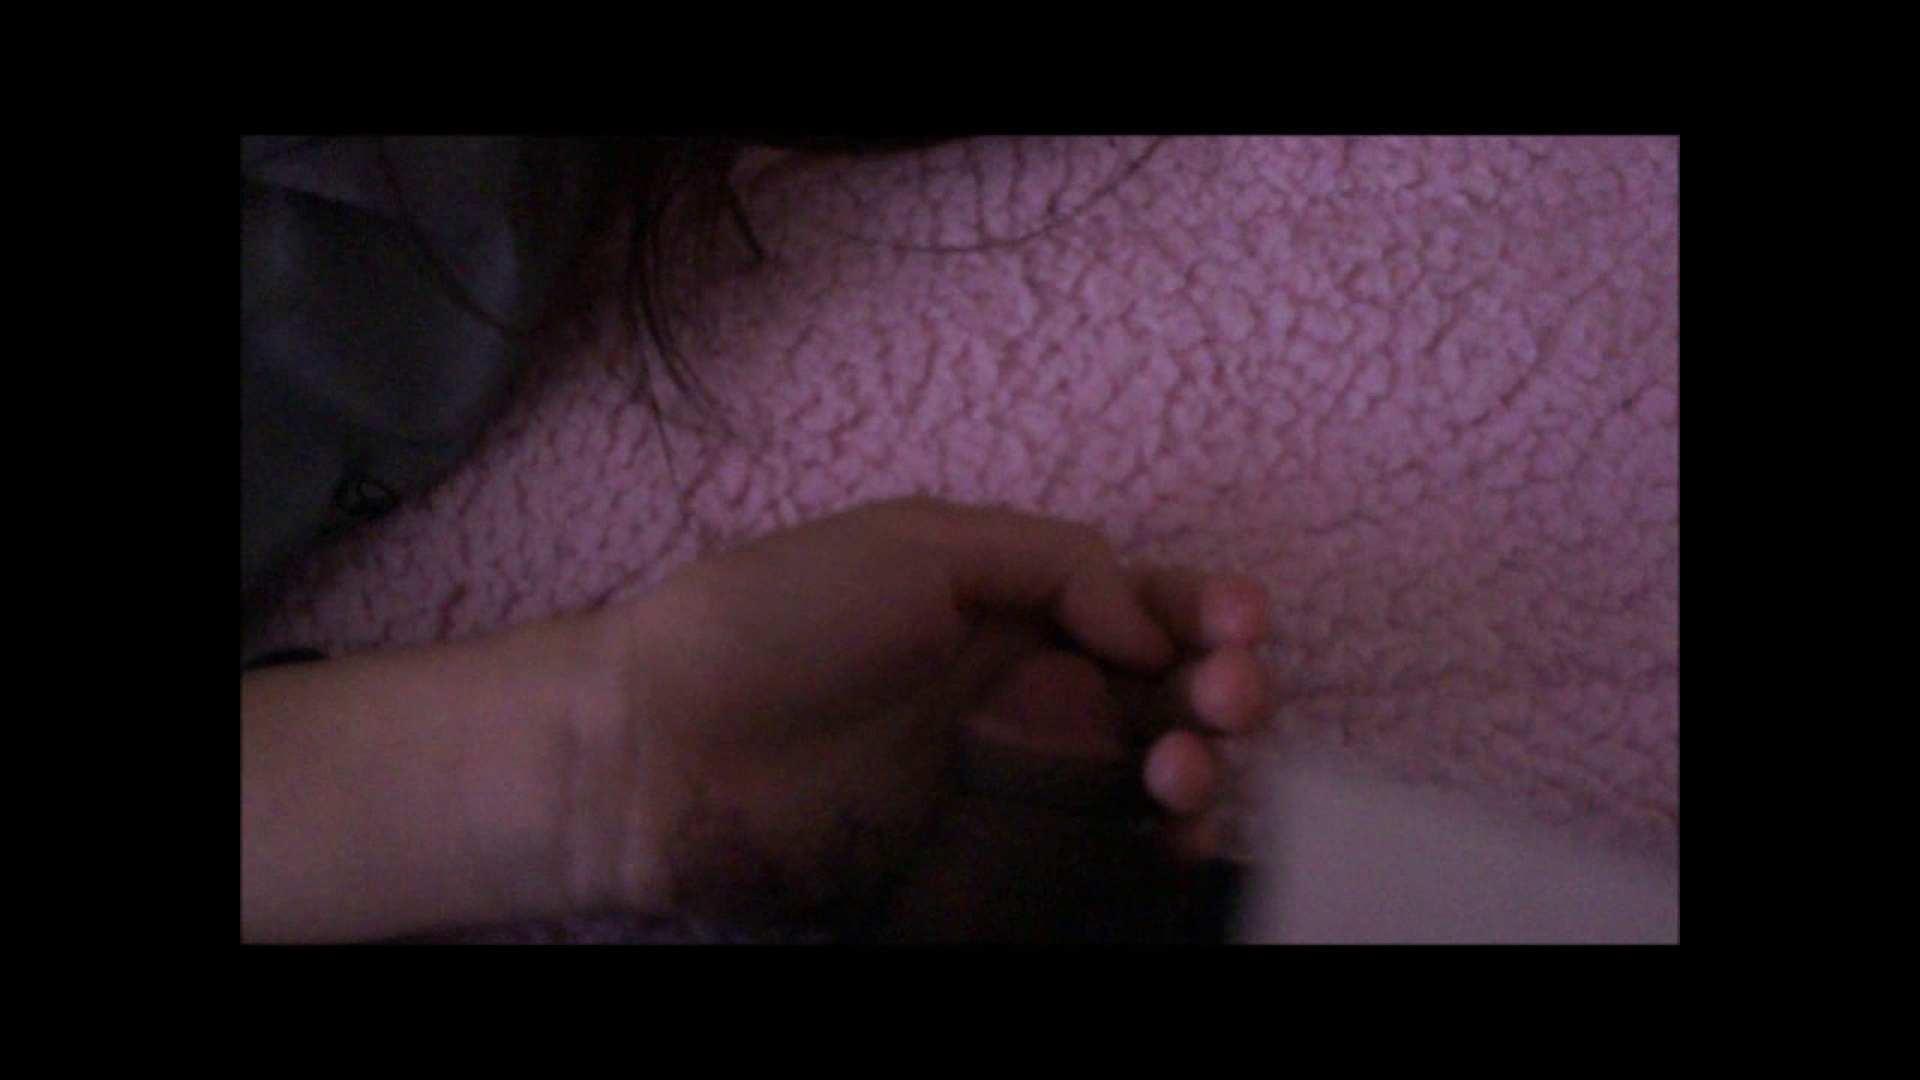 vol.15 友人が抱く葵への感情・・・弄ばれた巨乳。 セックスする女性達   いじくり  76画像 67